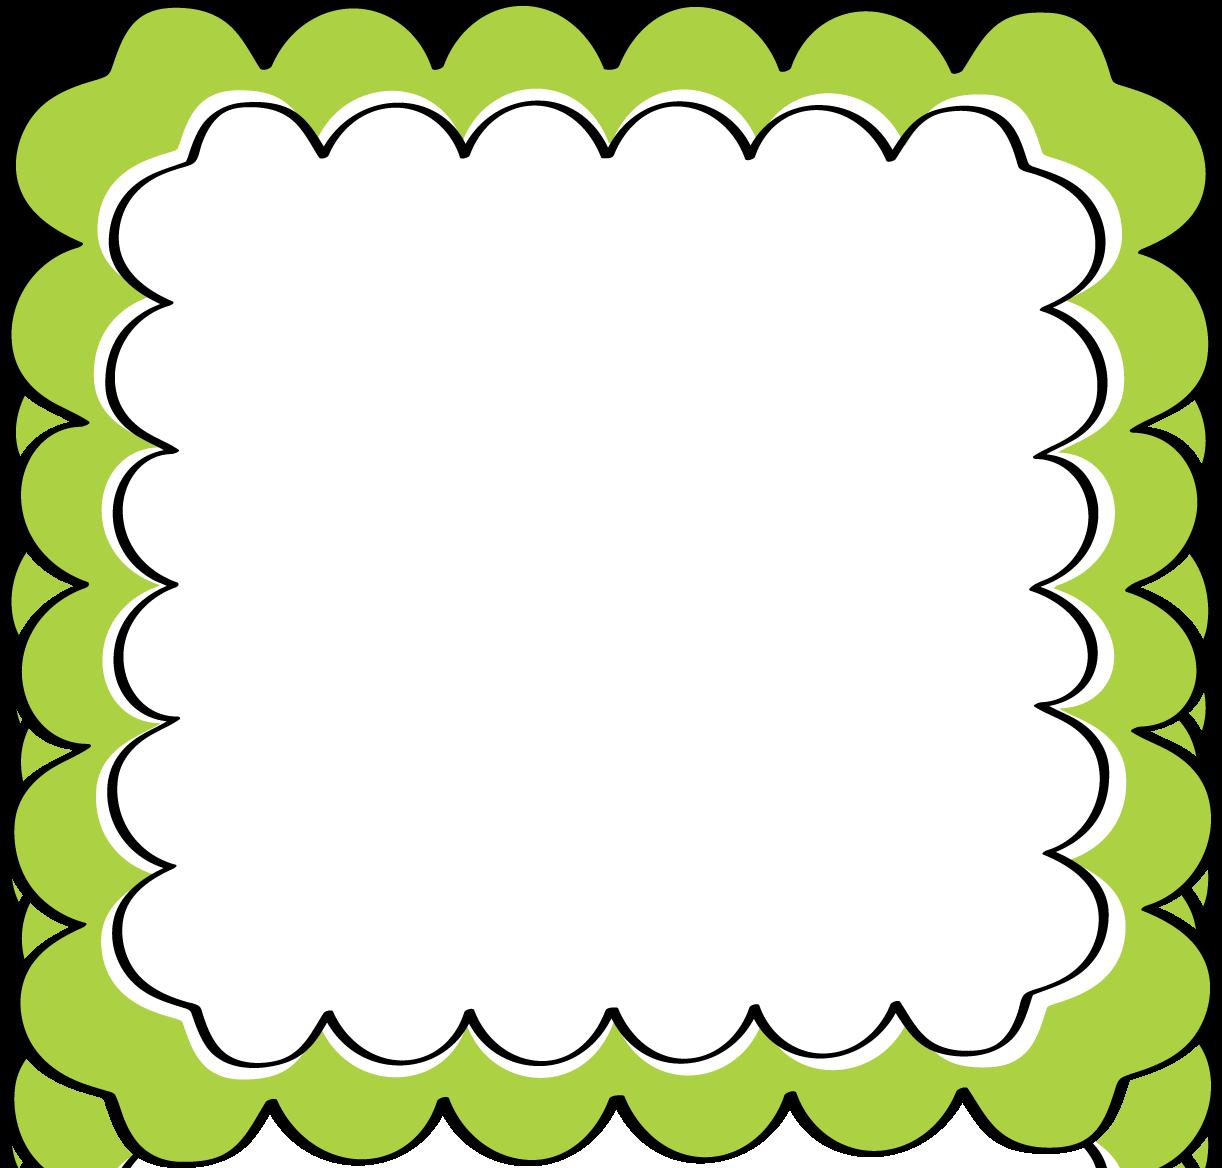 school theme border clipart green scalloped frame free clip art frames [ 1222 x 1168 Pixel ]